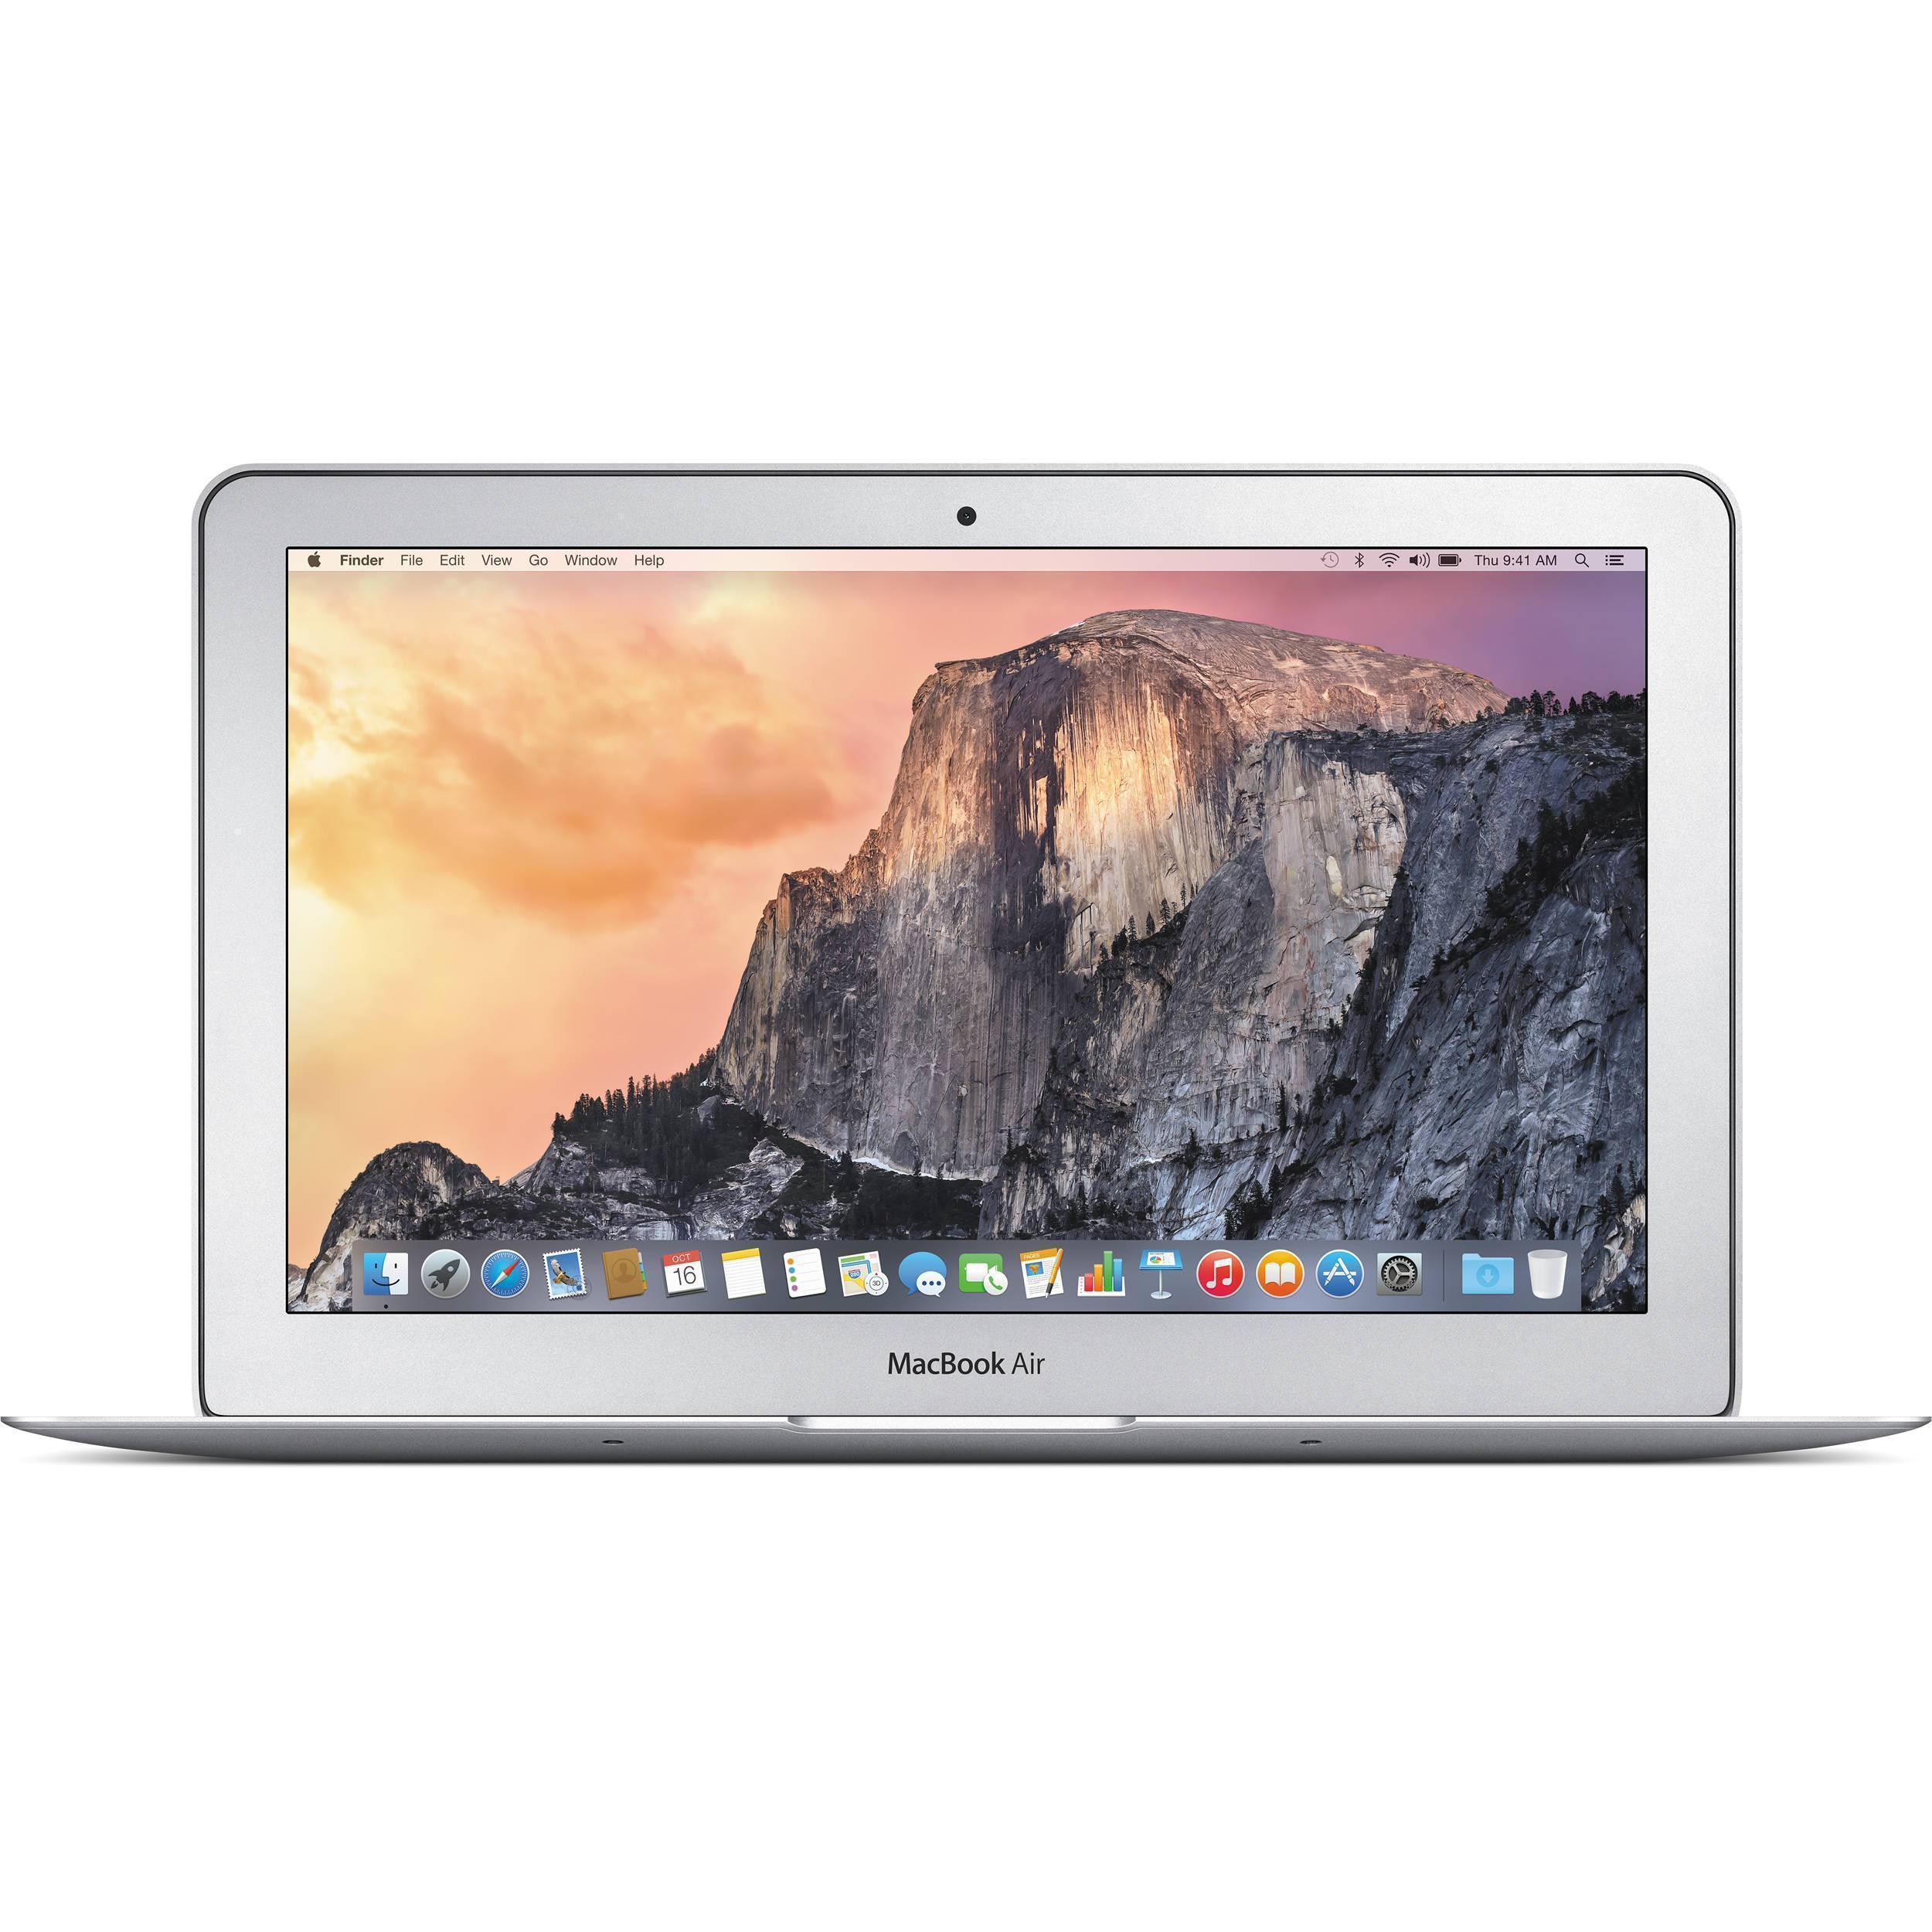 MacBook Air 11.6-inch (2014) - Core i5 - 4GB - SSD 256 GB QWERTY